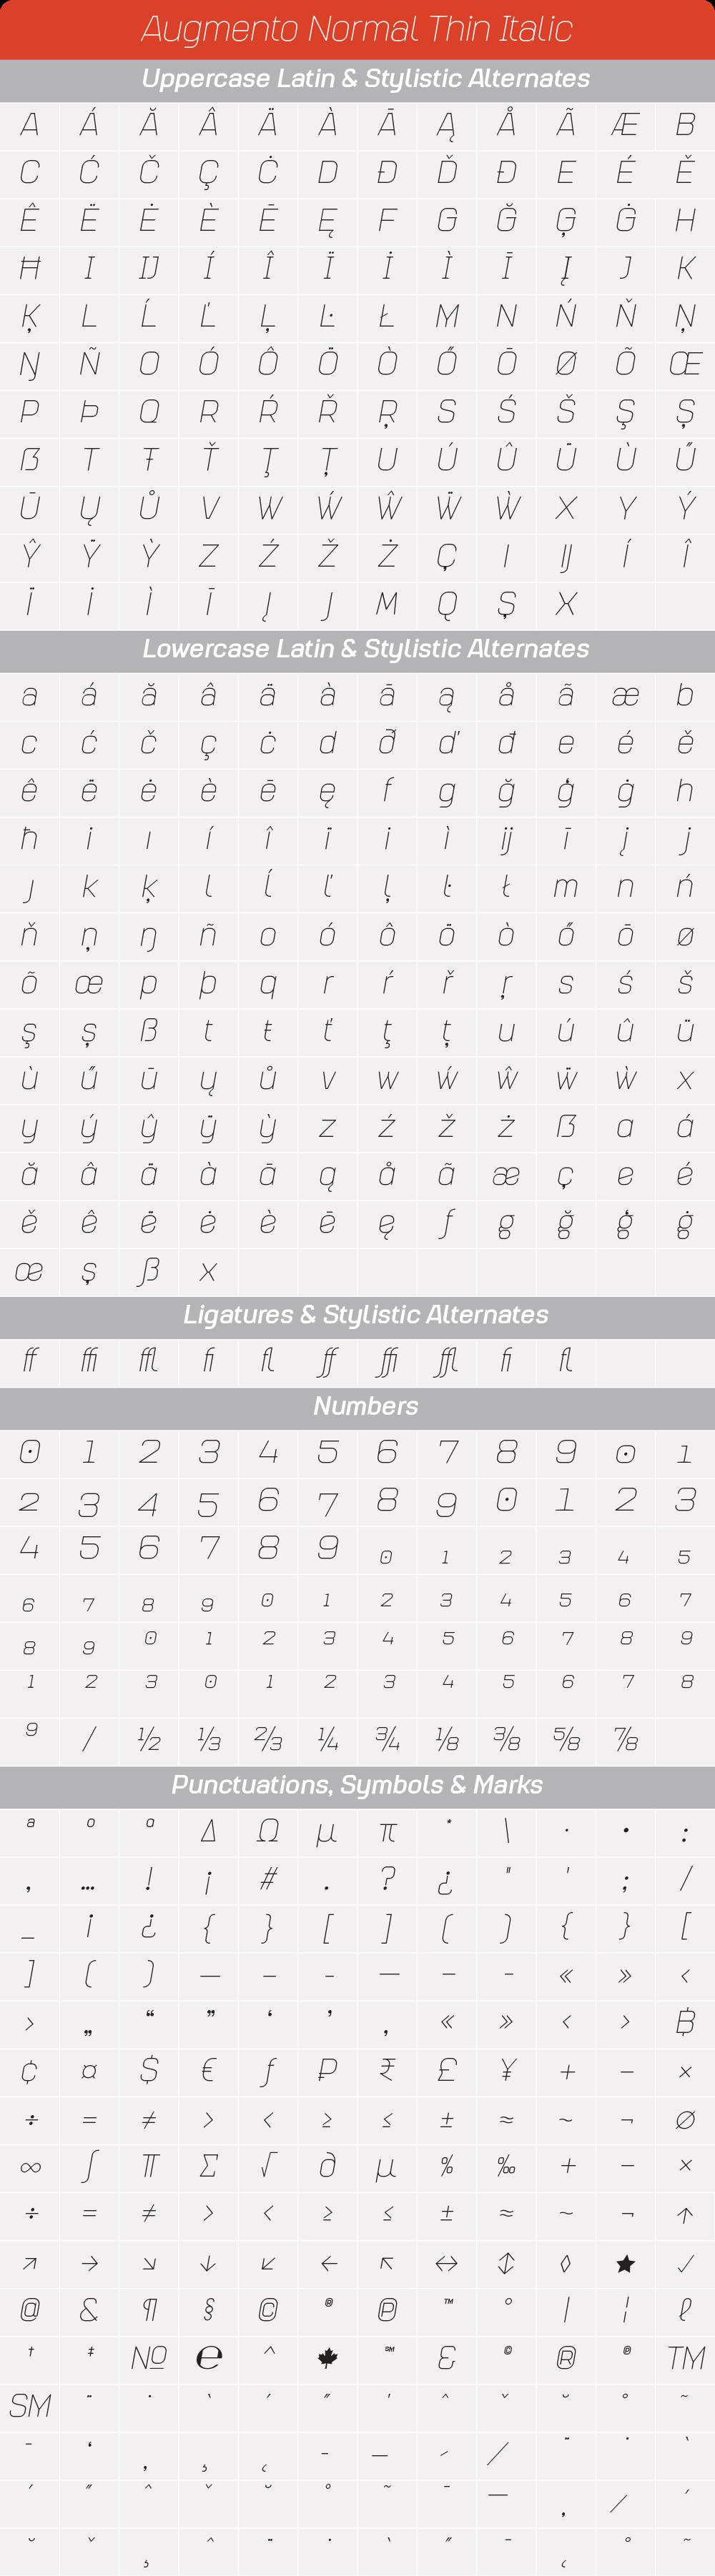 Normal Thin ItalicAugmento-GlyphTable.png